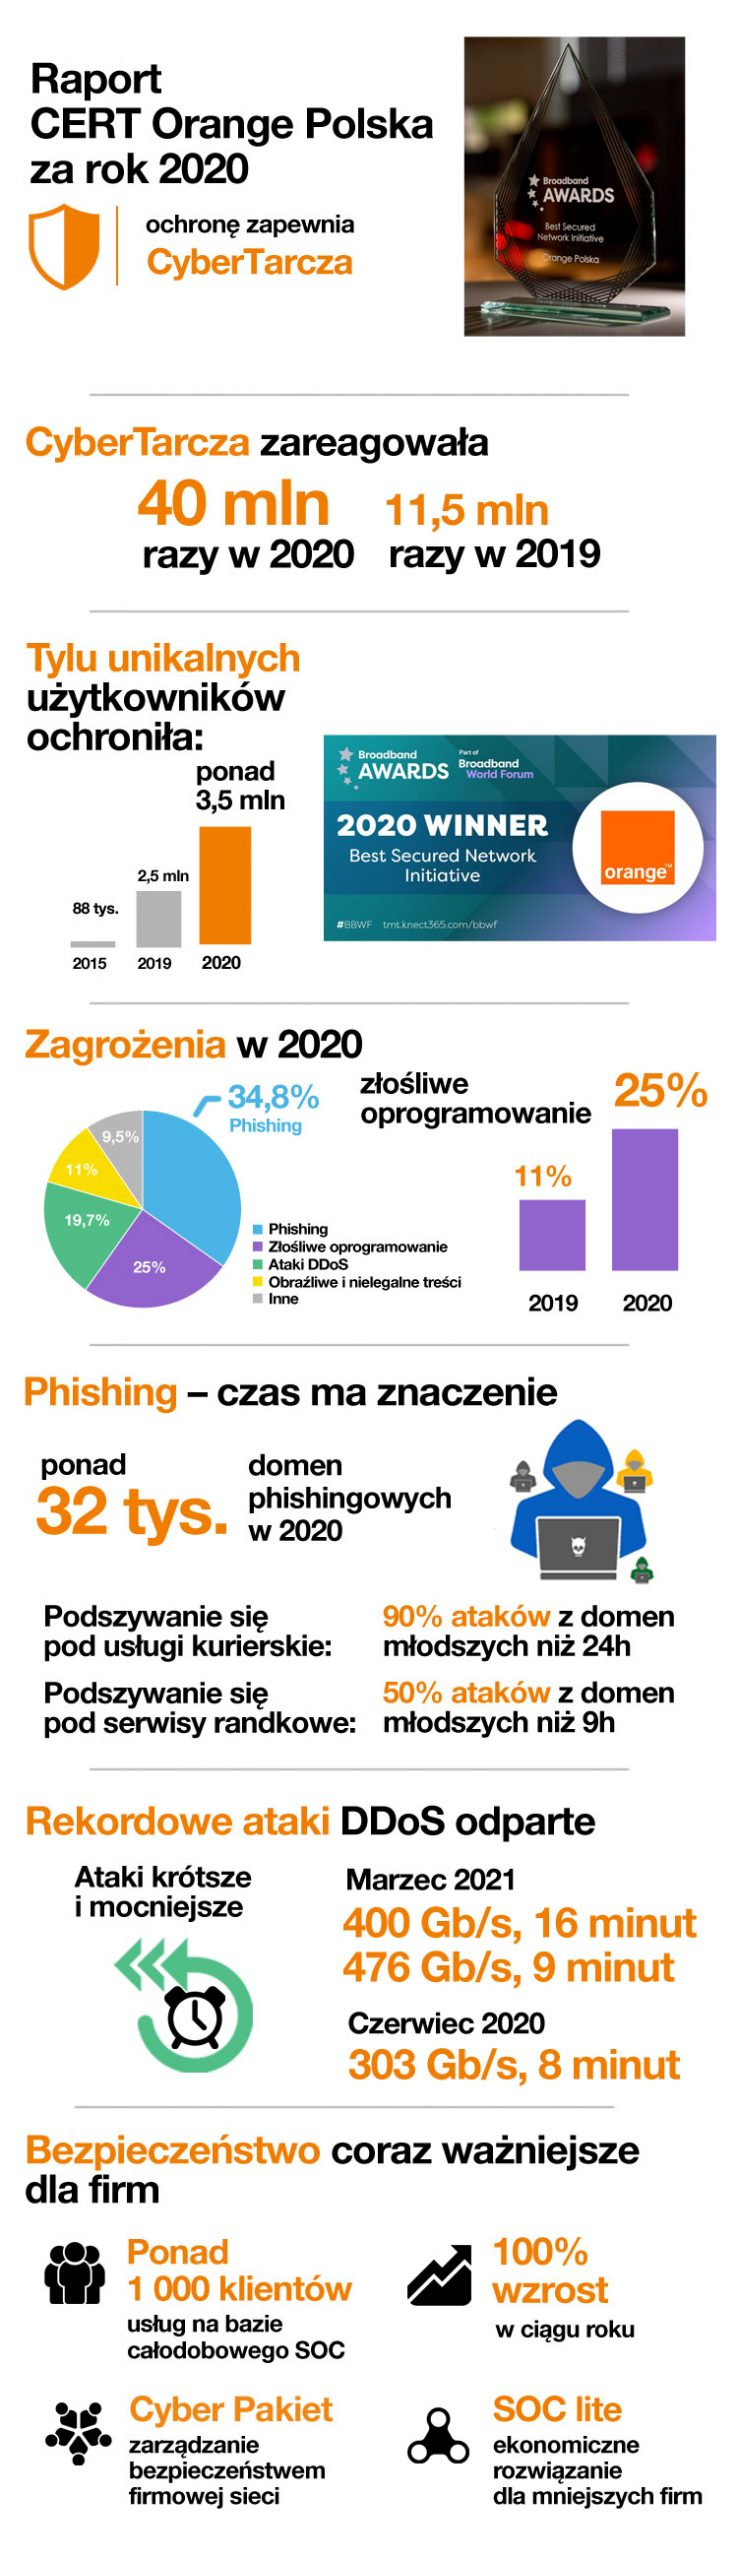 raport cert 2020 scaled